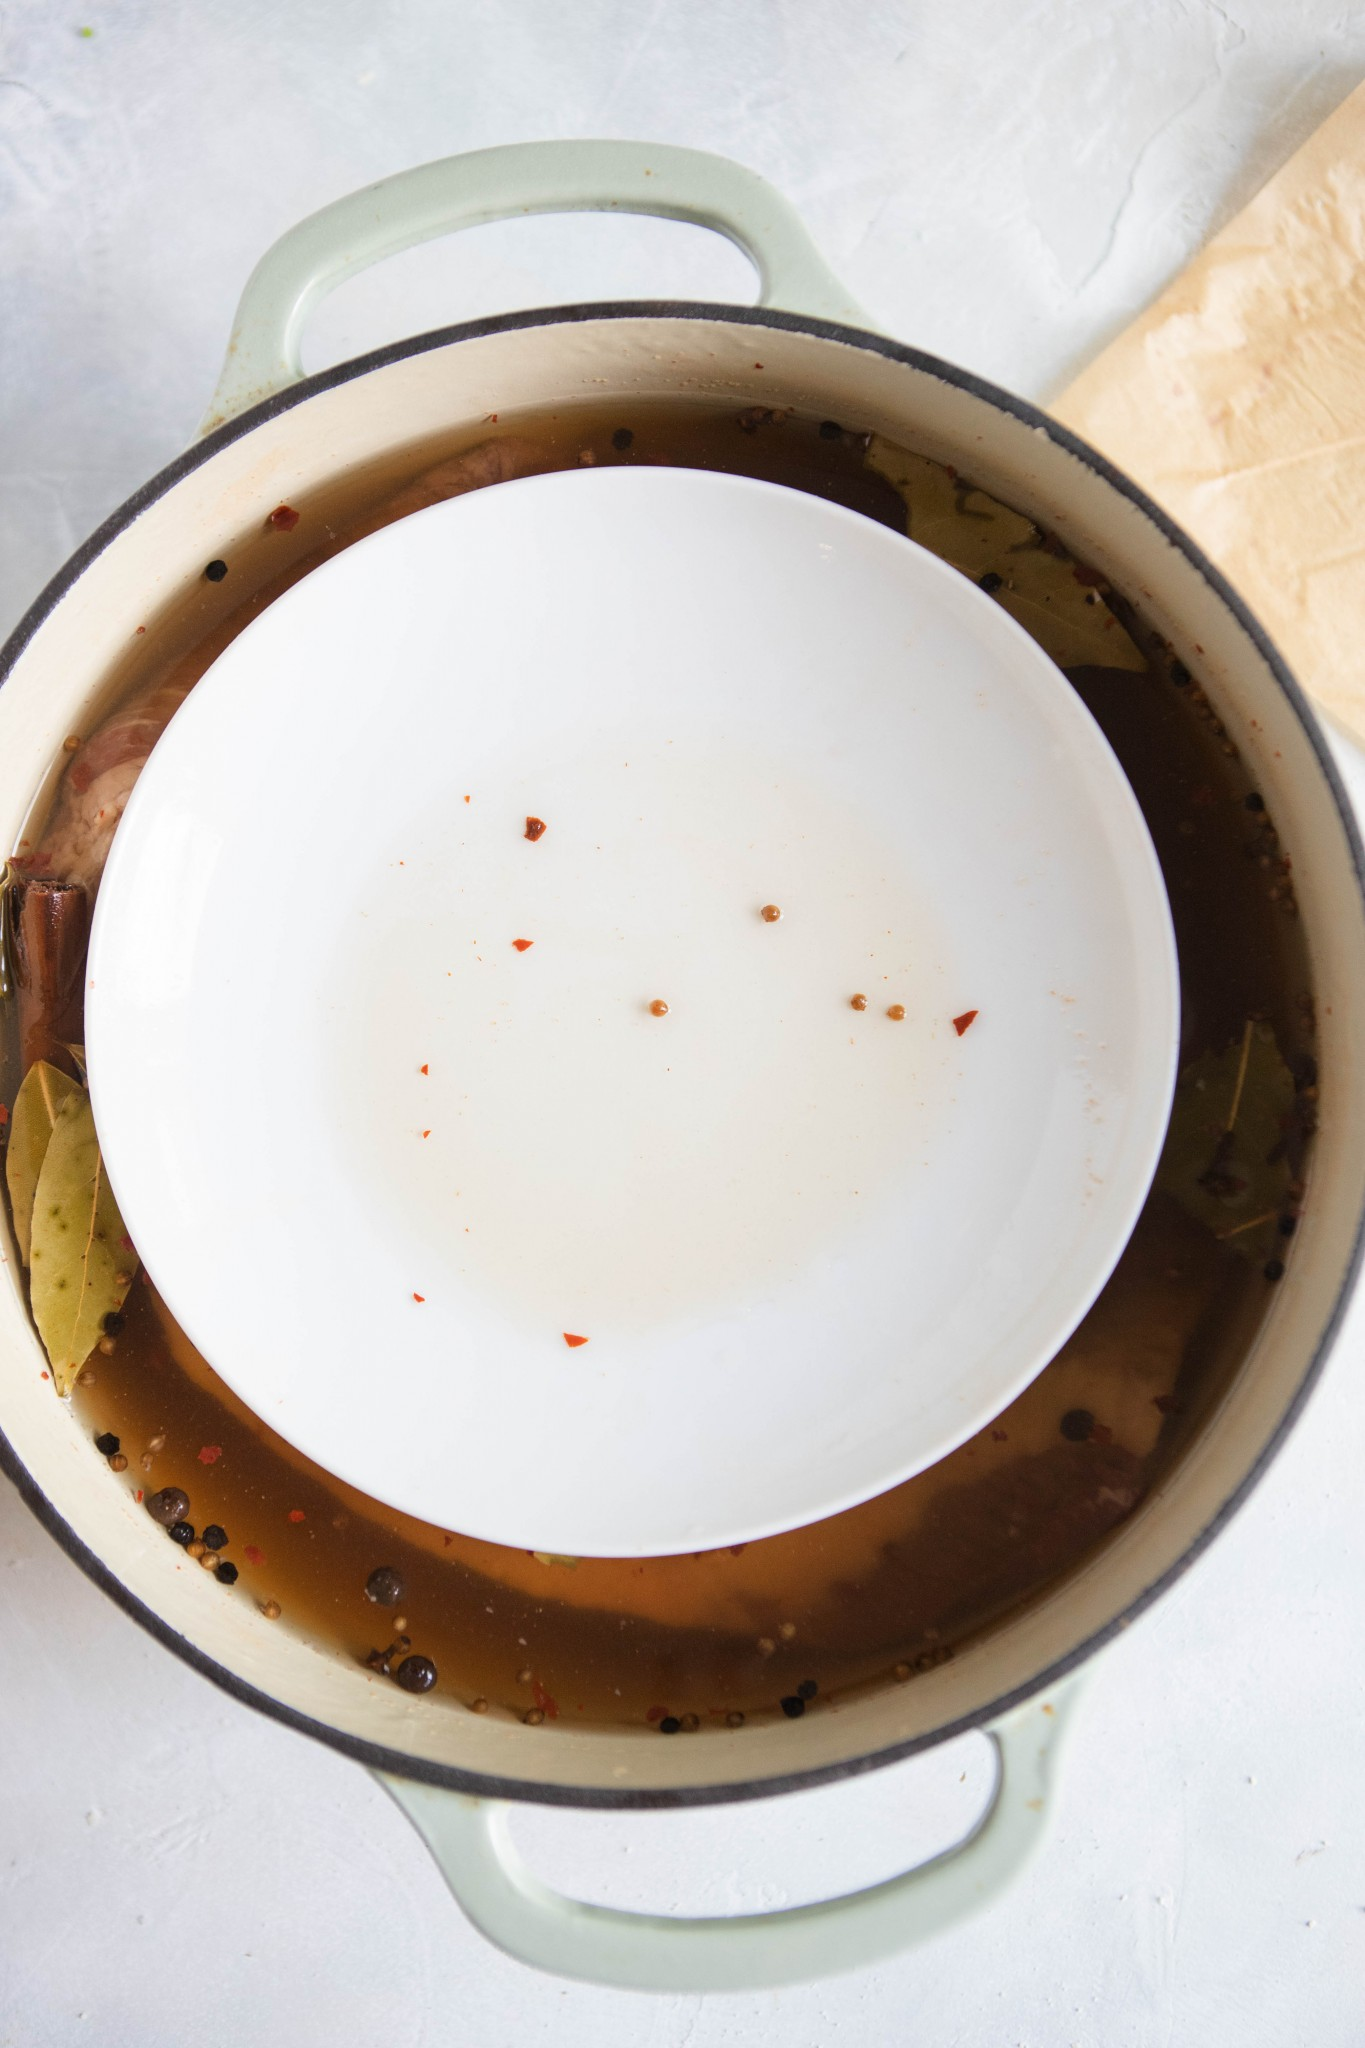 plate set over beef brisket sitting in brine